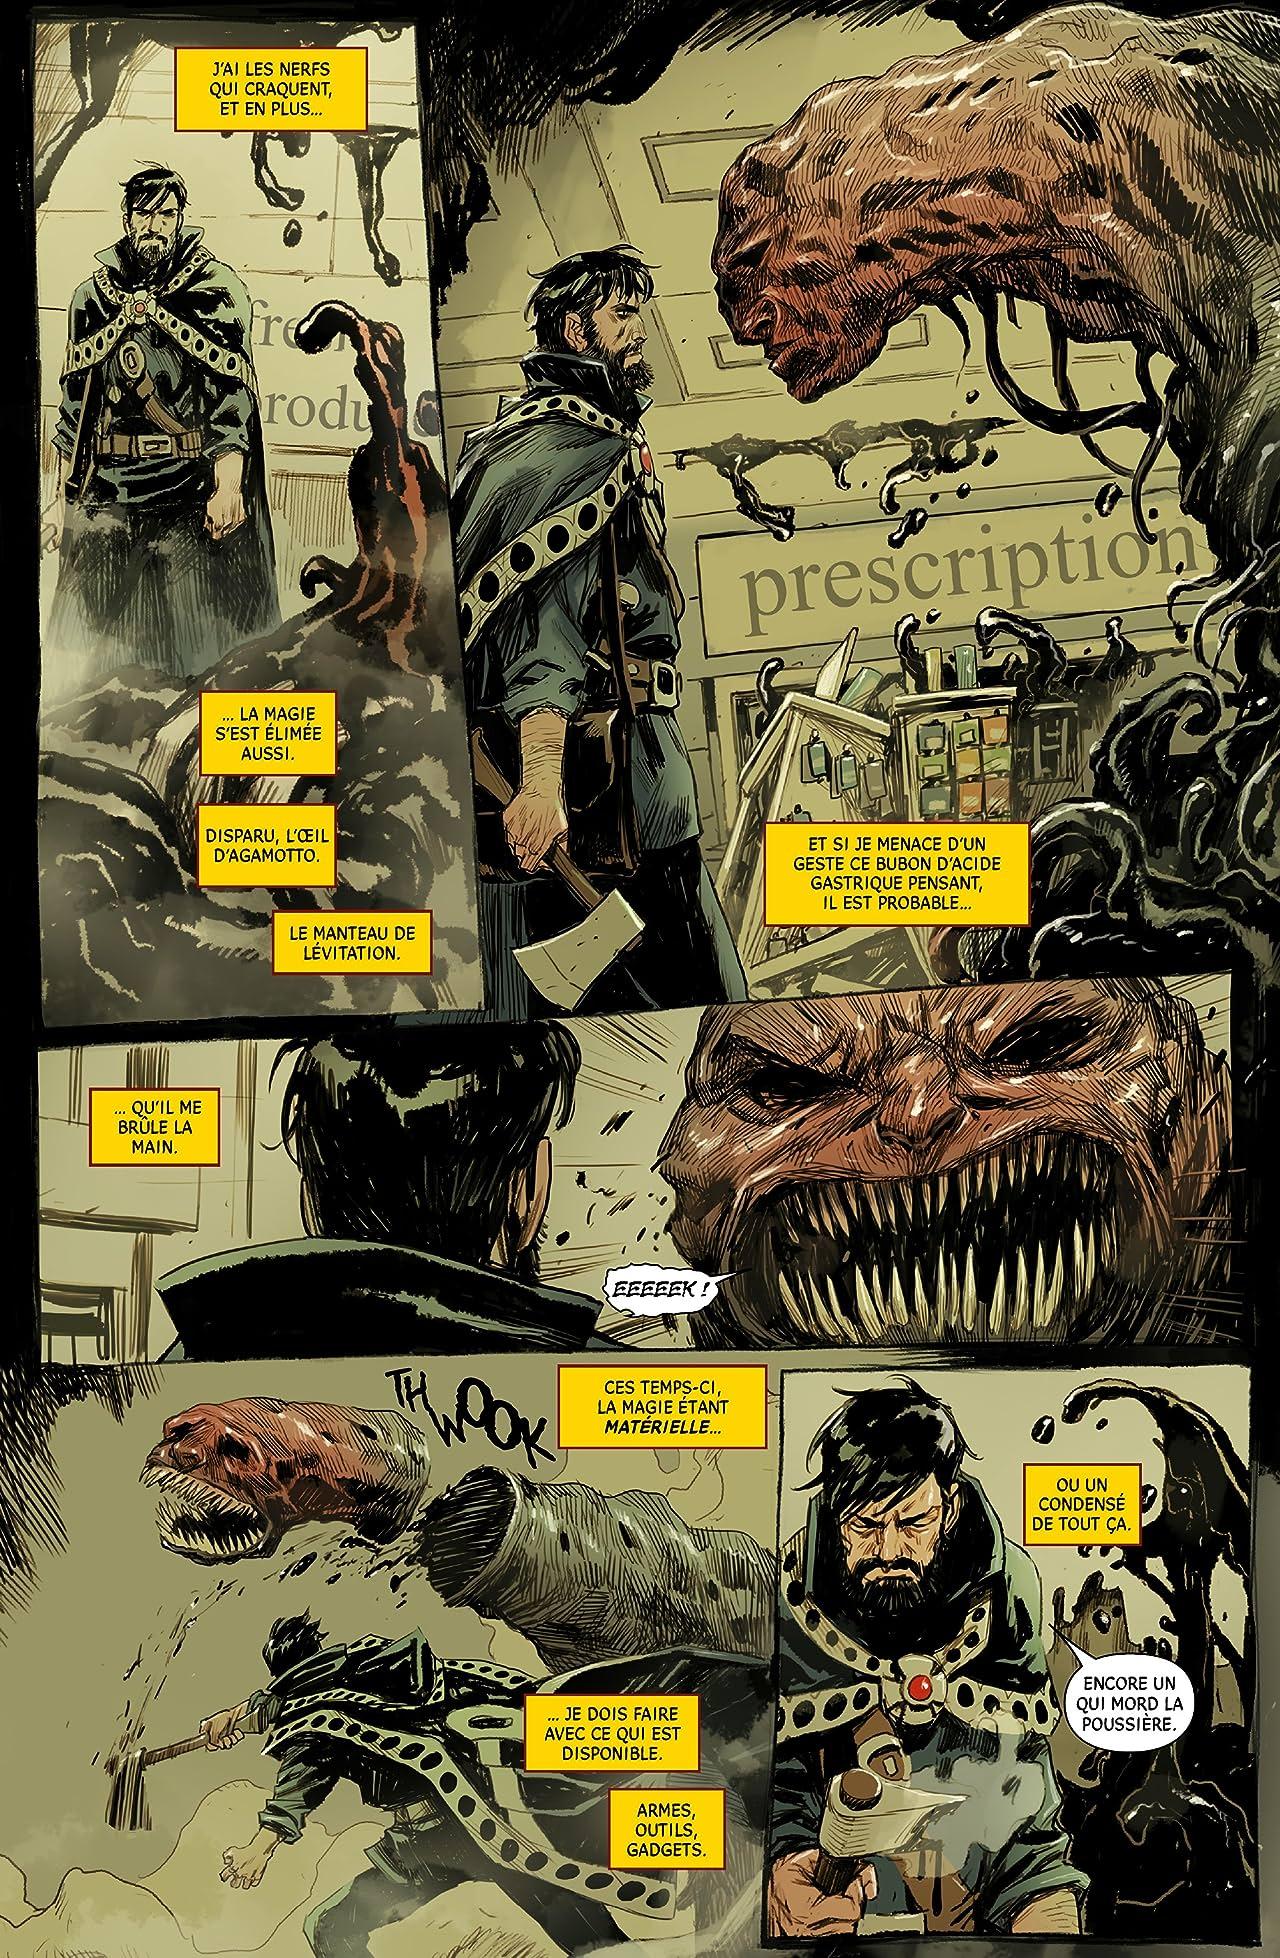 Doctor Strange Vol. 5: Secret empire